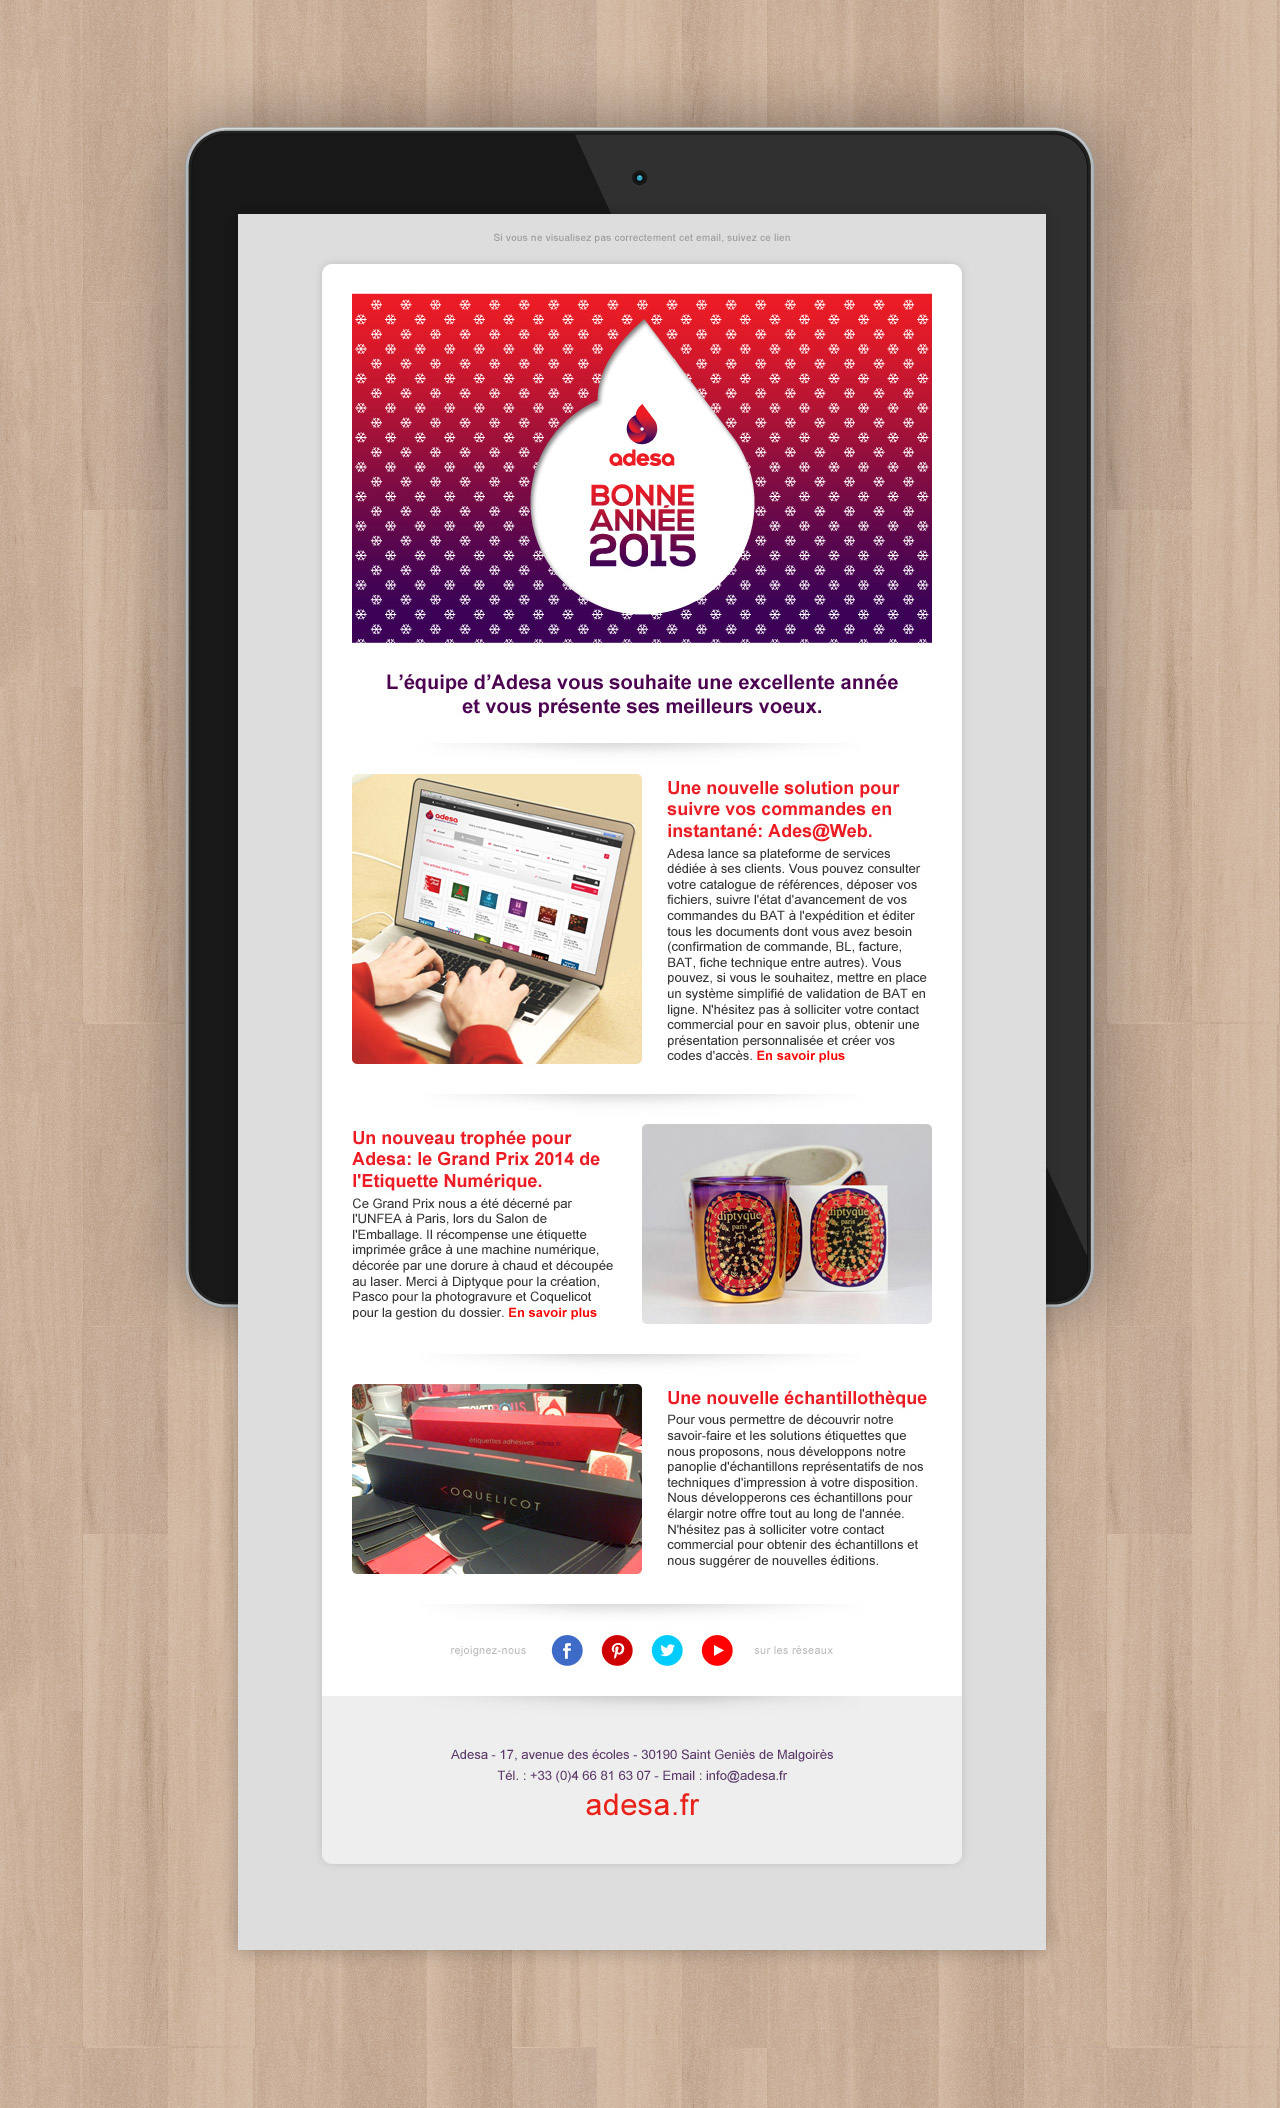 adesa-newsletter-voeux-2015-design-creation-communication-caconcept-alexis-cretin-graphiste